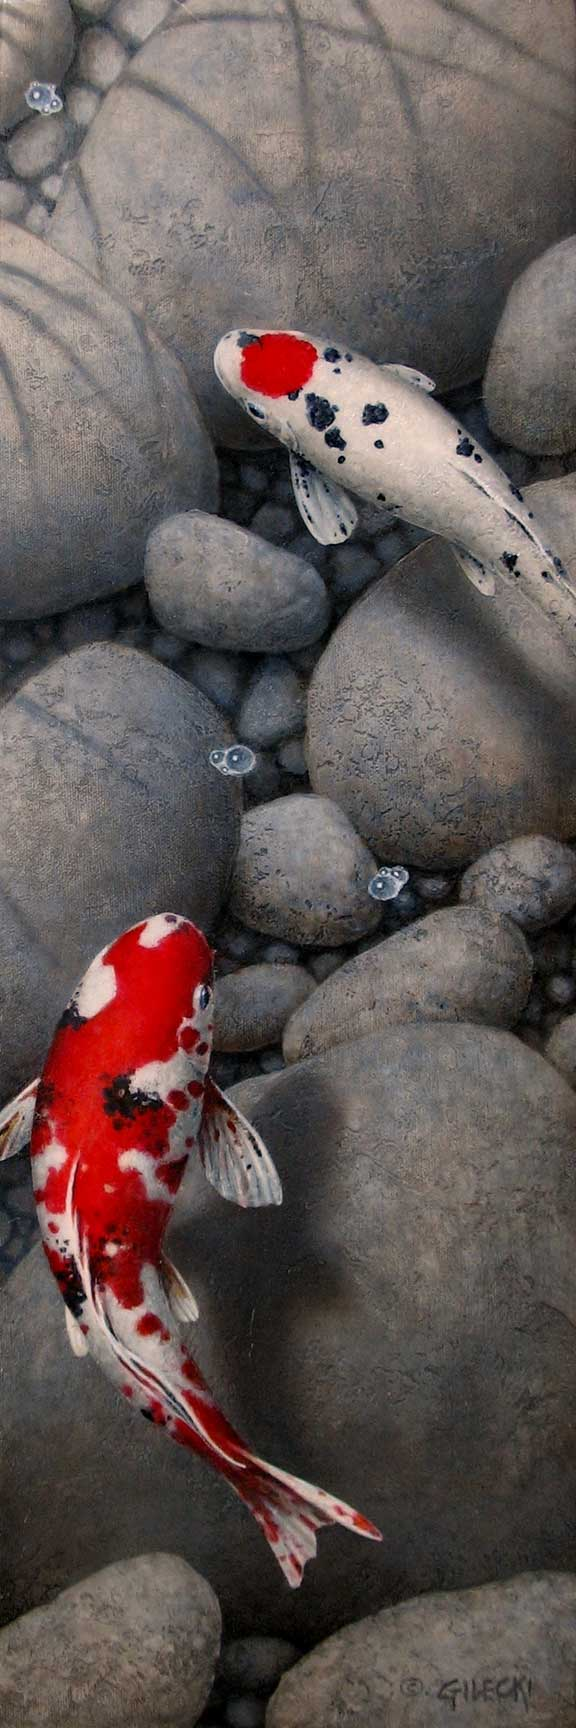 painting og Koi fish on gray rocksey